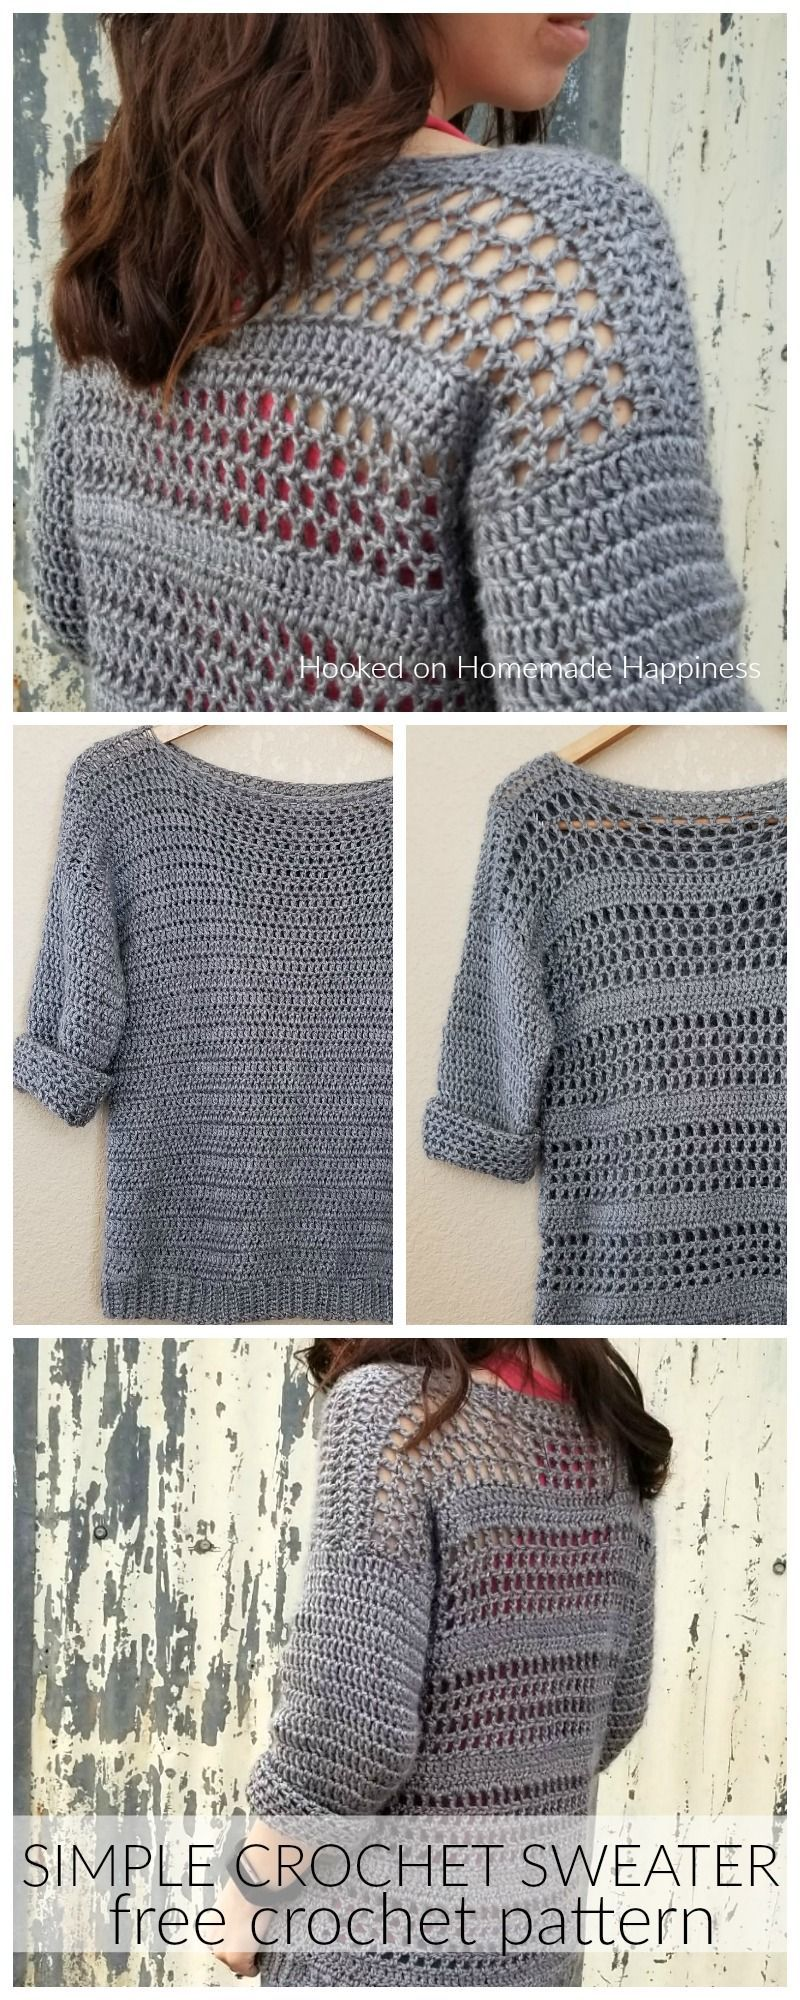 Evde Kartondan Tavan Yapm Pinterest Crochet Sweater Patterns